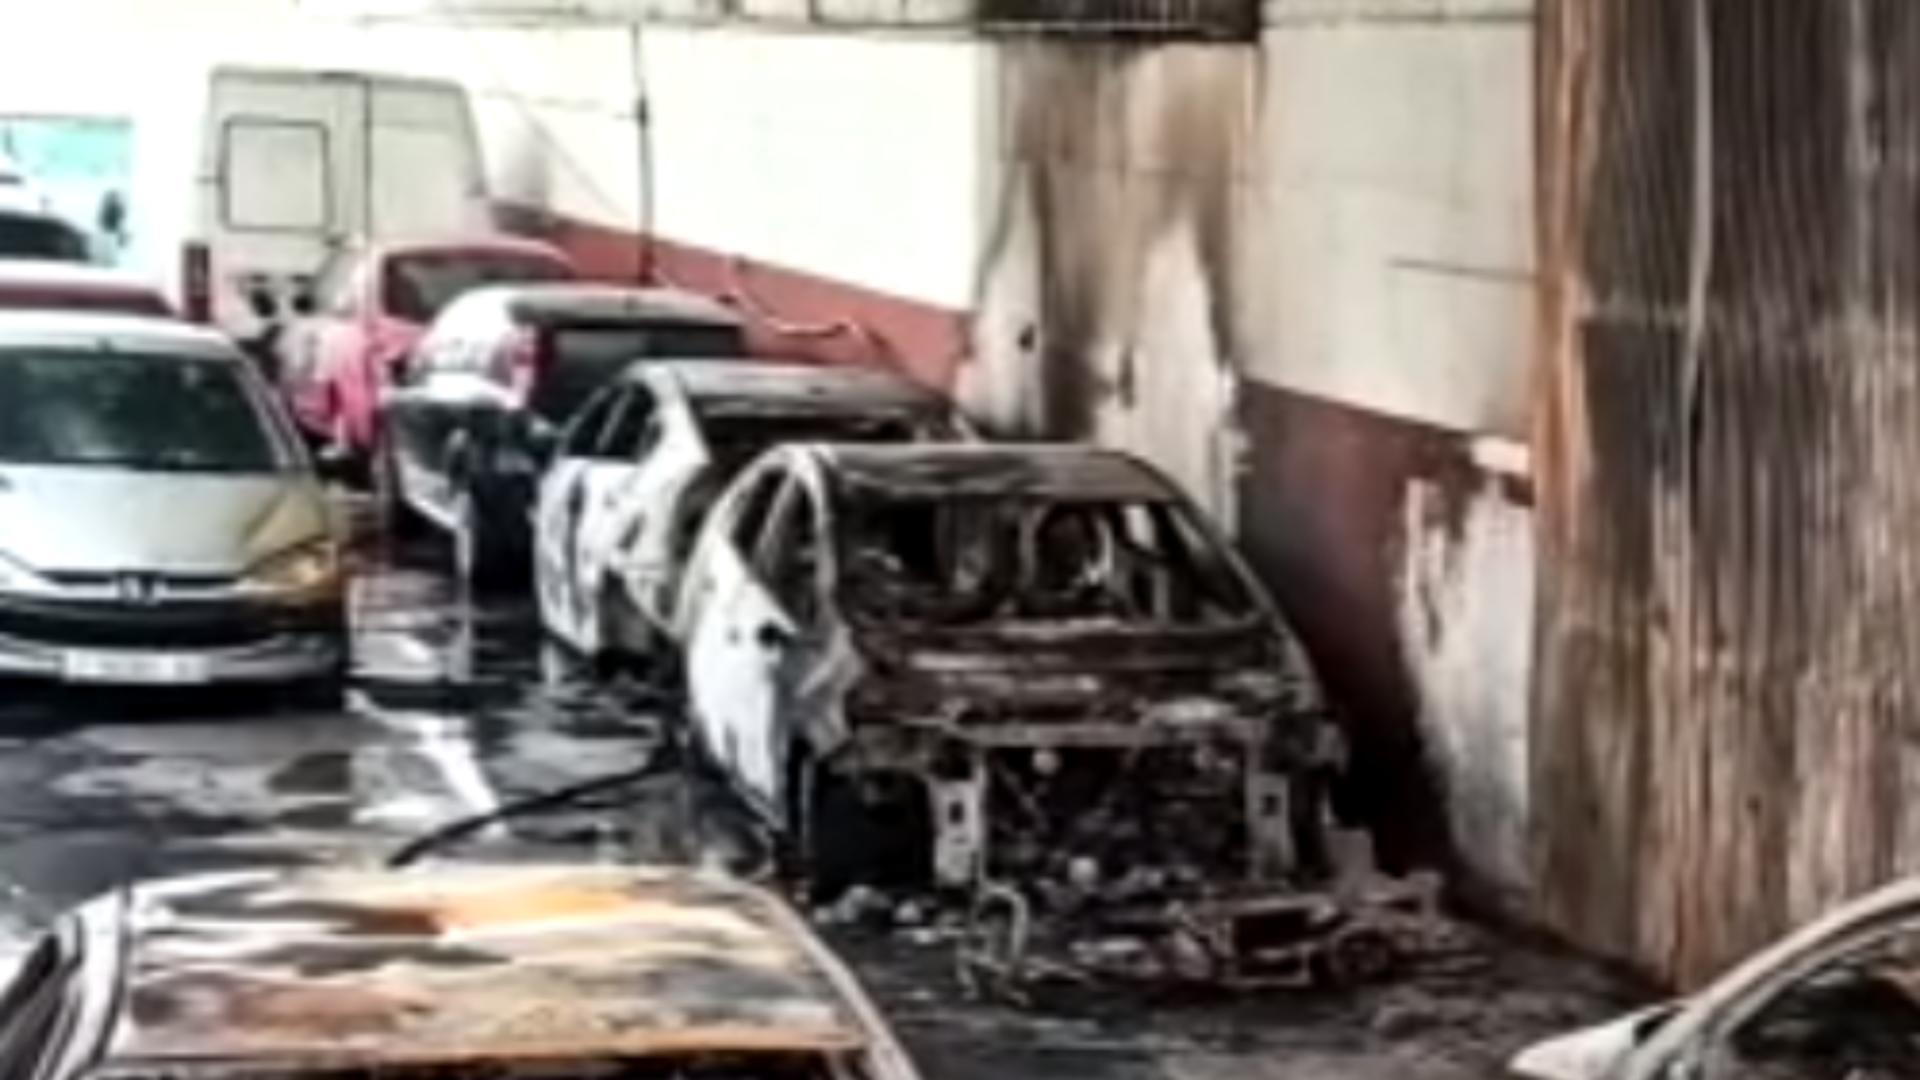 Incendiu la un atelier auto. Foto: captură sevilla. abc.es